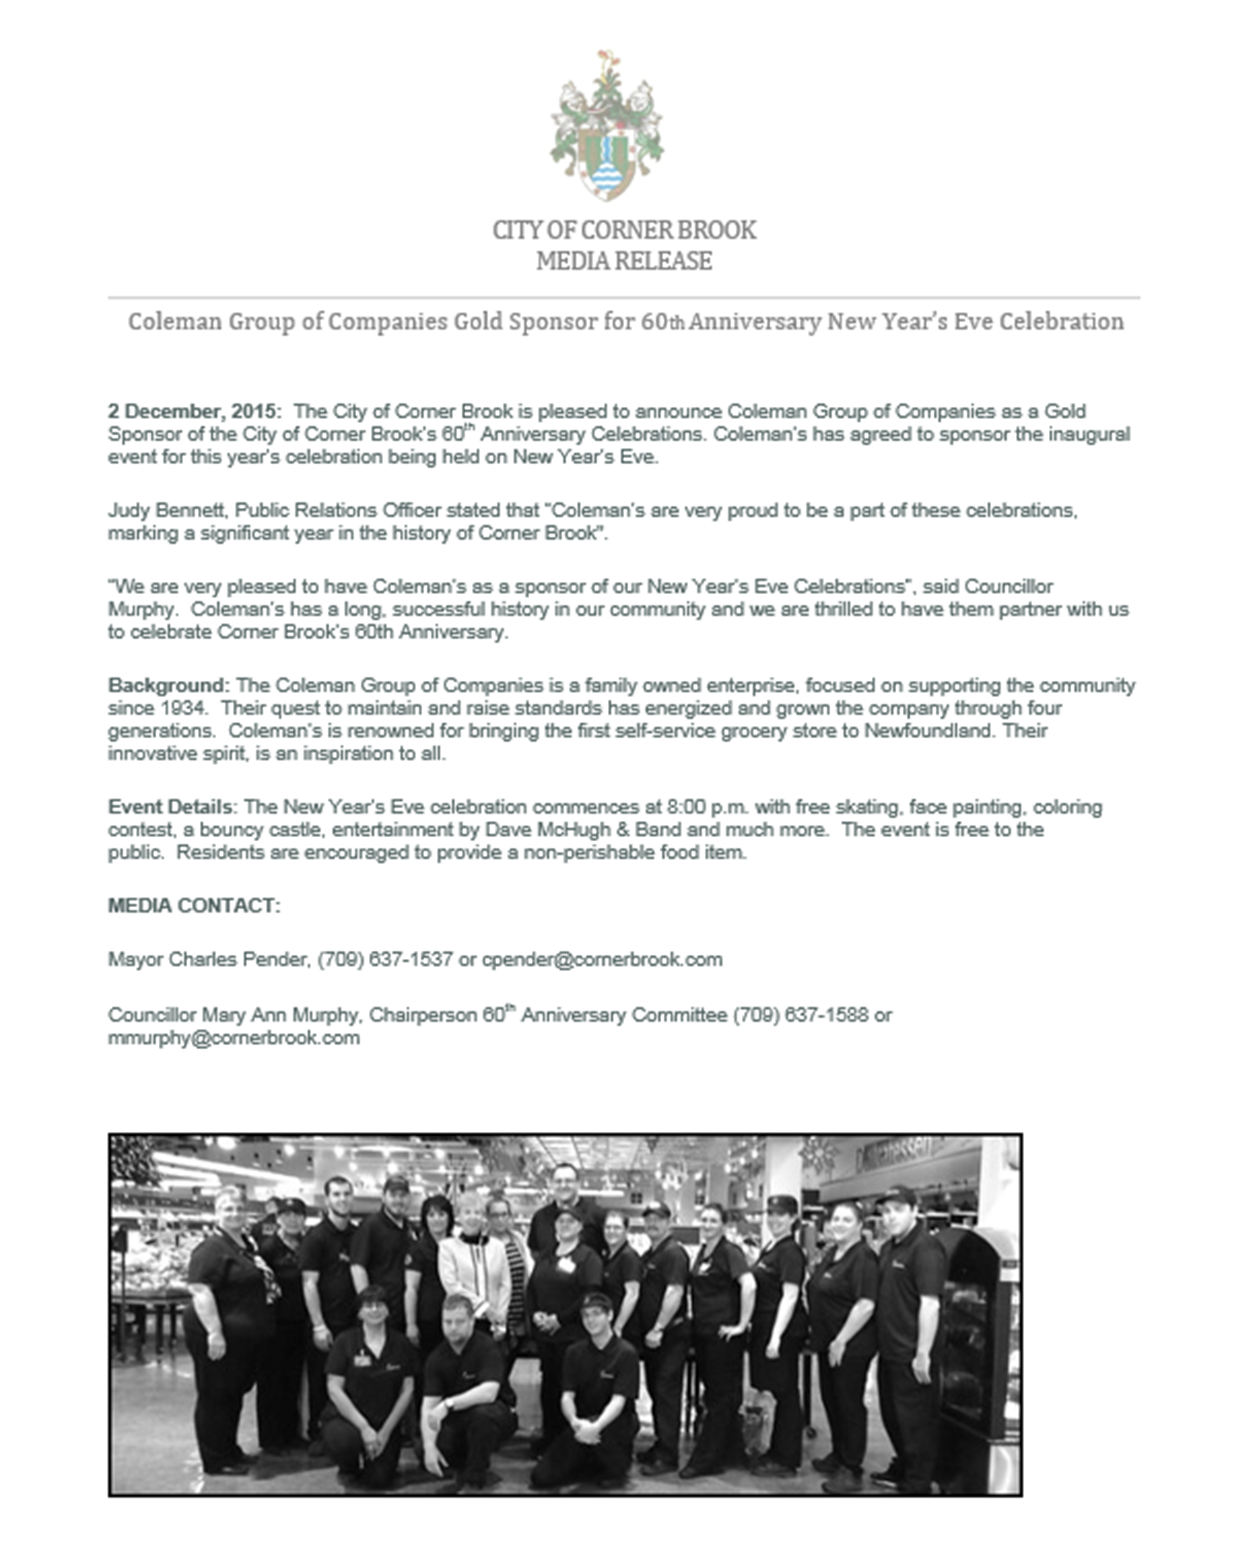 colemans Media release